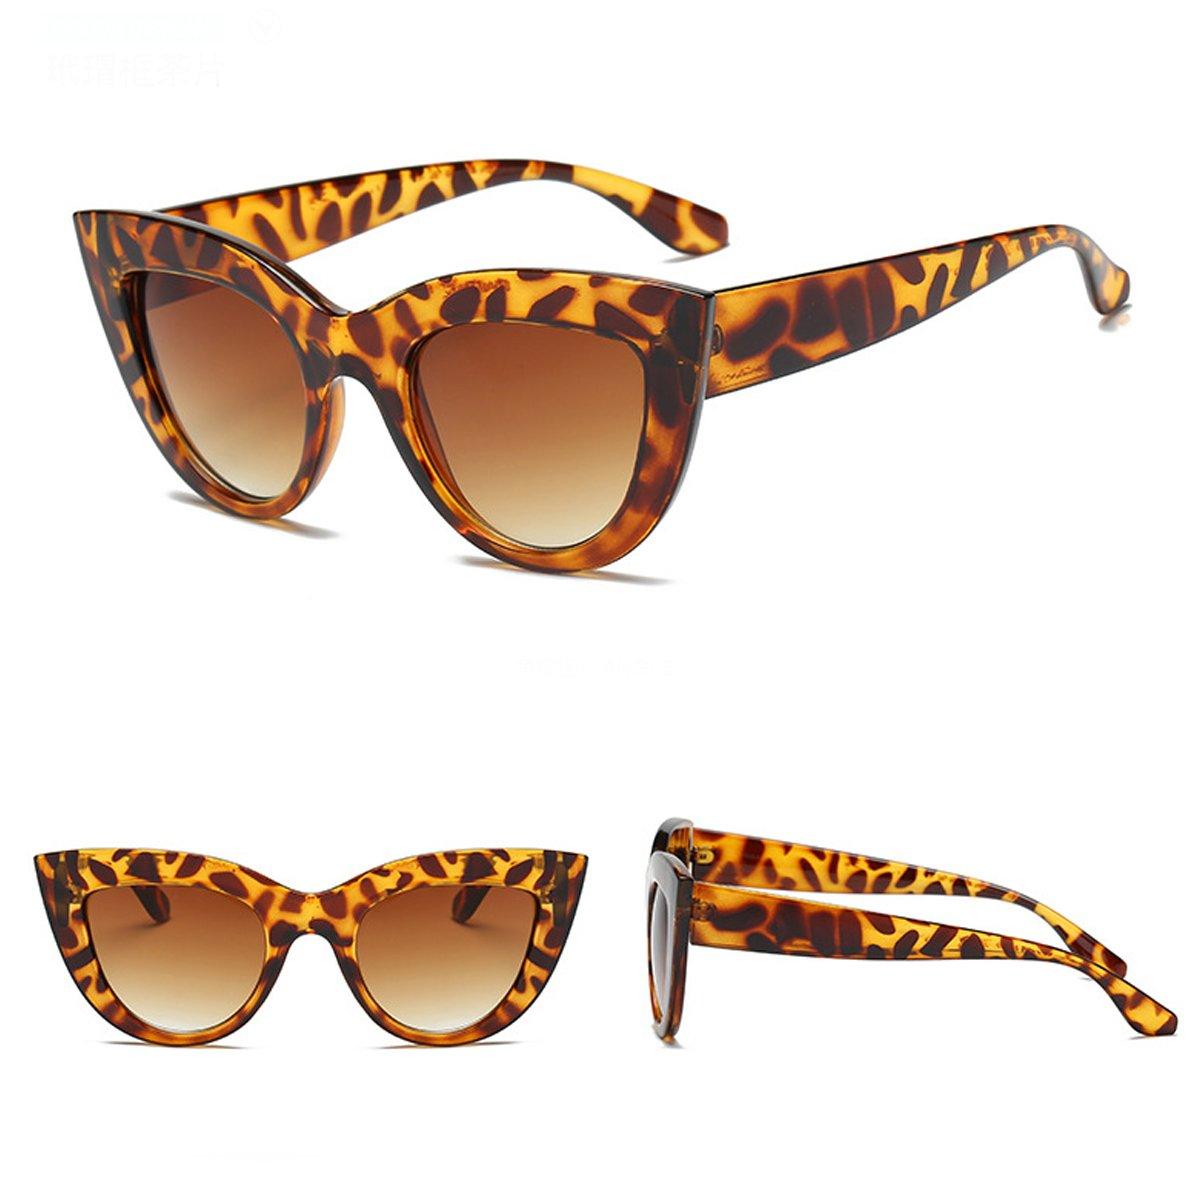 8f6488edc91b Amazon.com: Oversized Square Sunglasses Cat's Eye Sunglasses(Leopard Print  Frame): Clothing